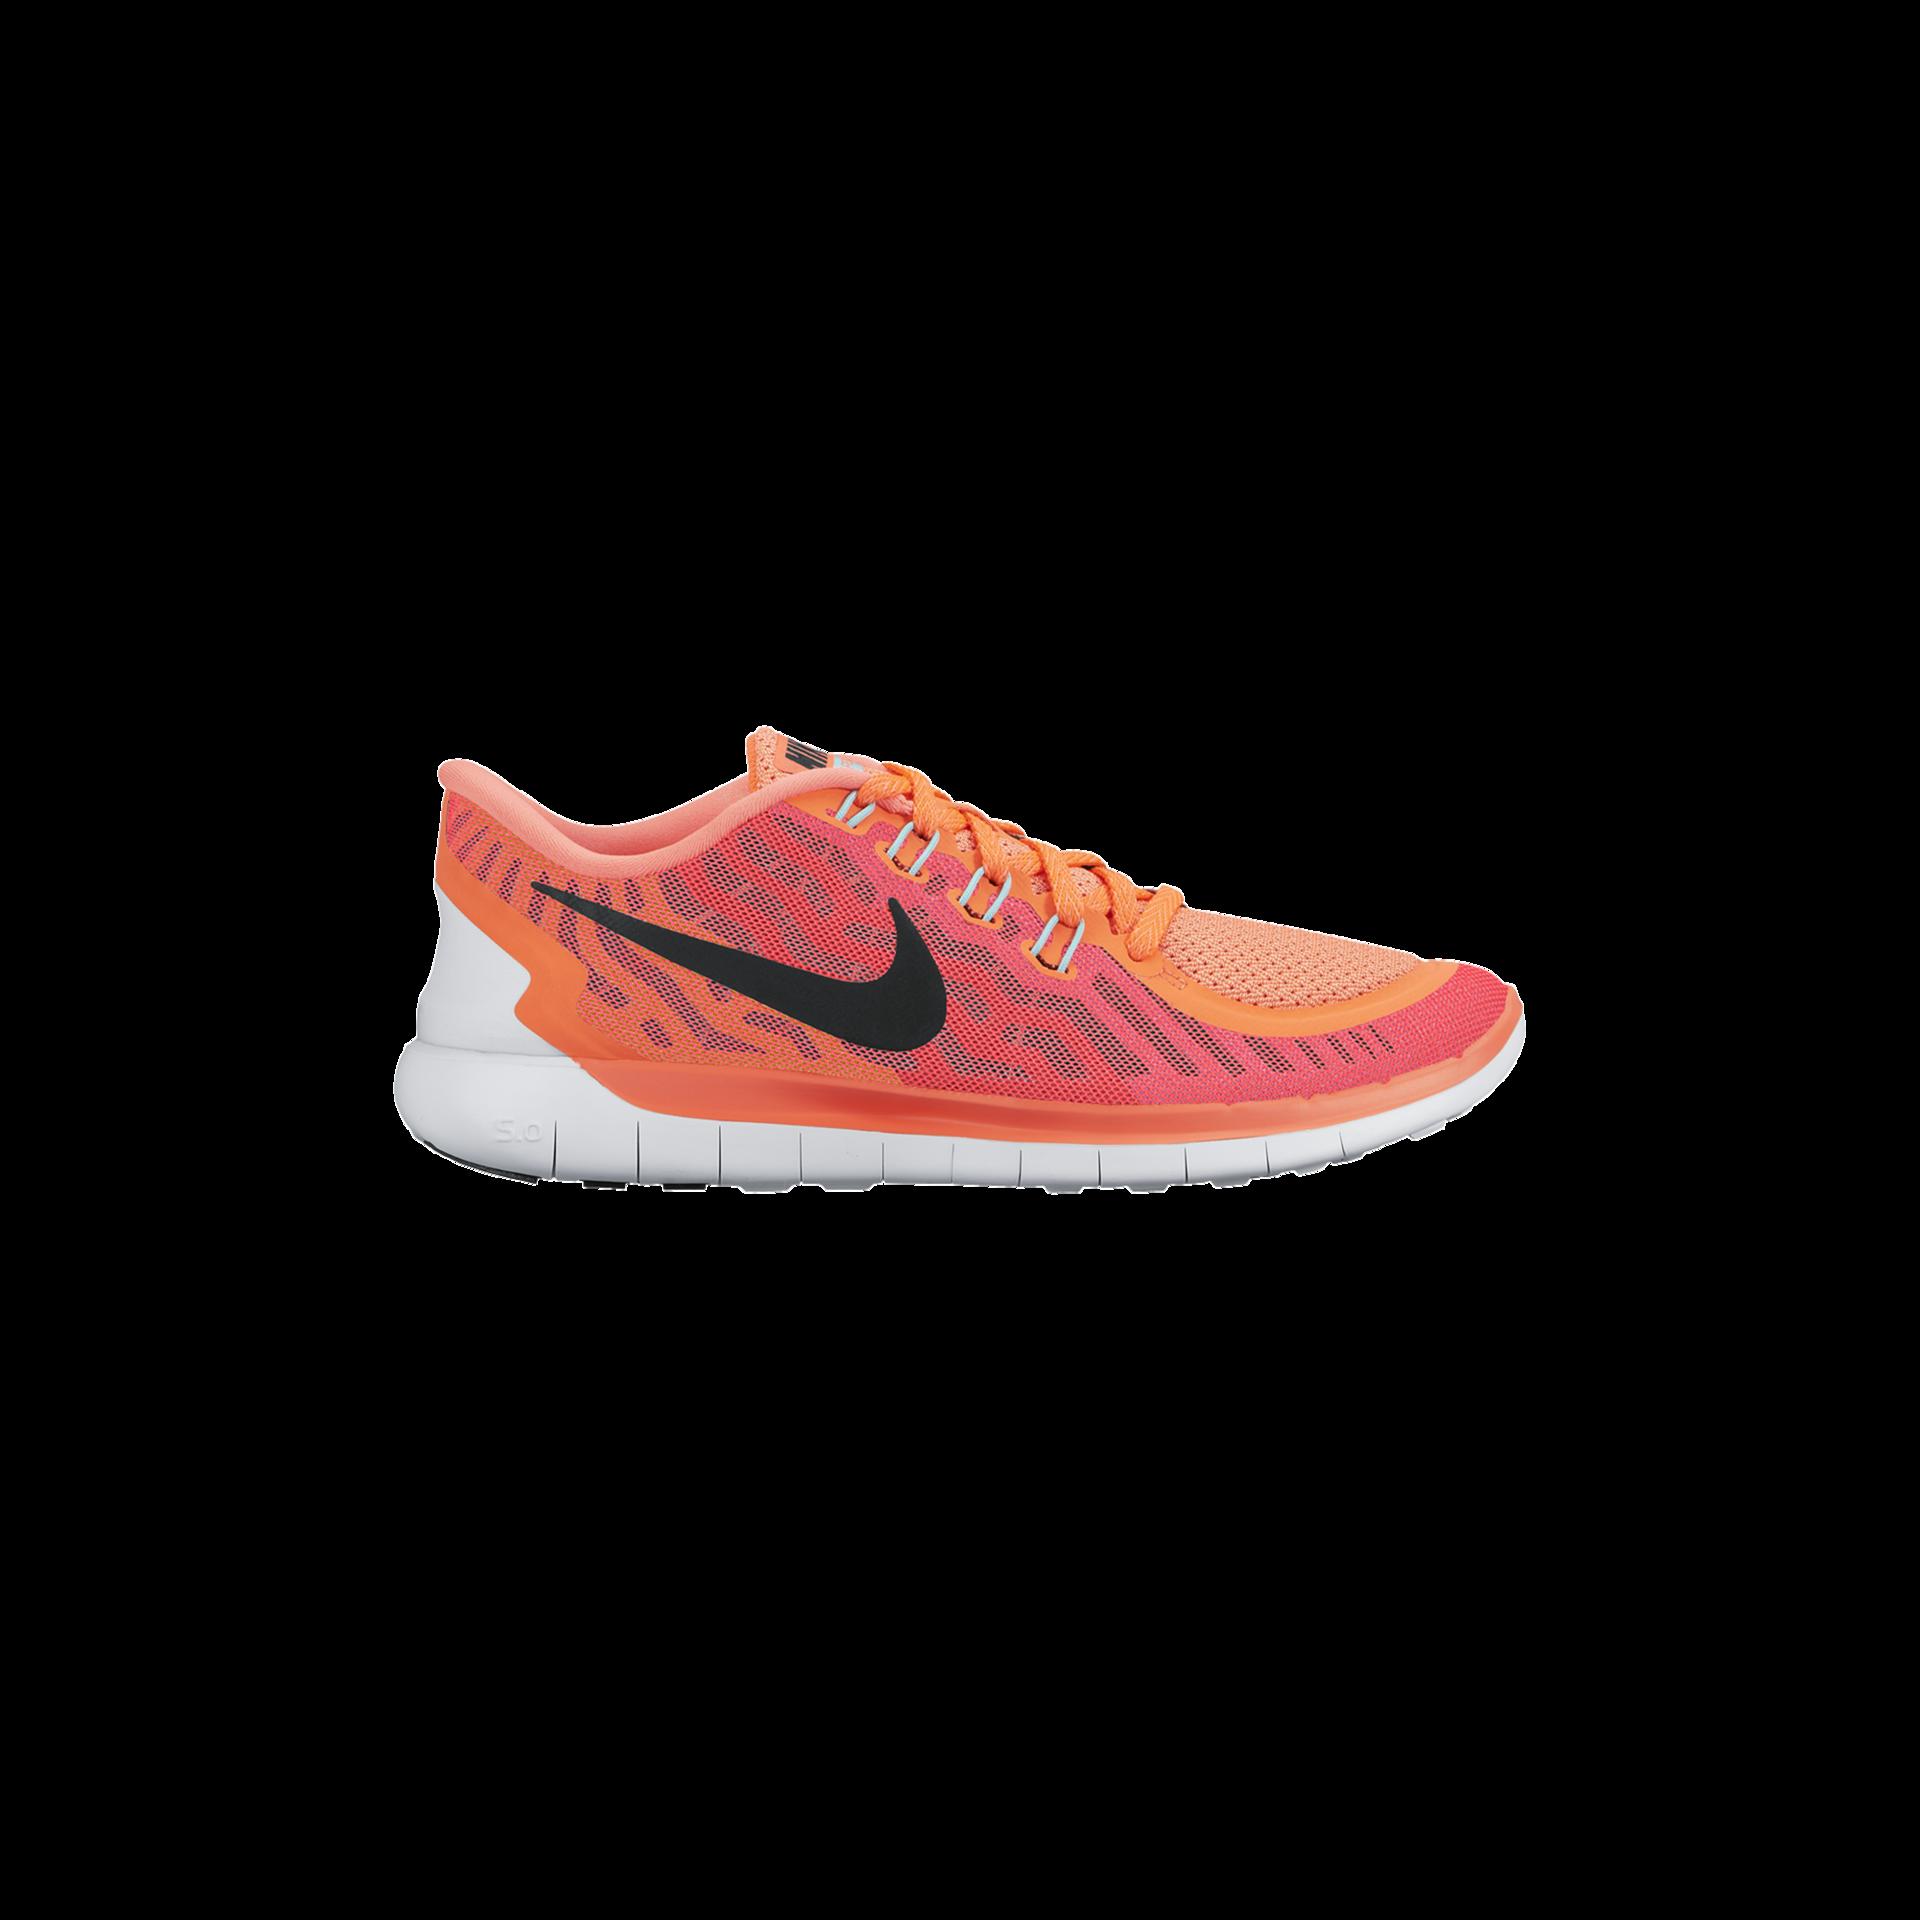 reputable site 13895 1132e Nike Free 5.0 Hardloopschoenen Lava RoodZwart Dames